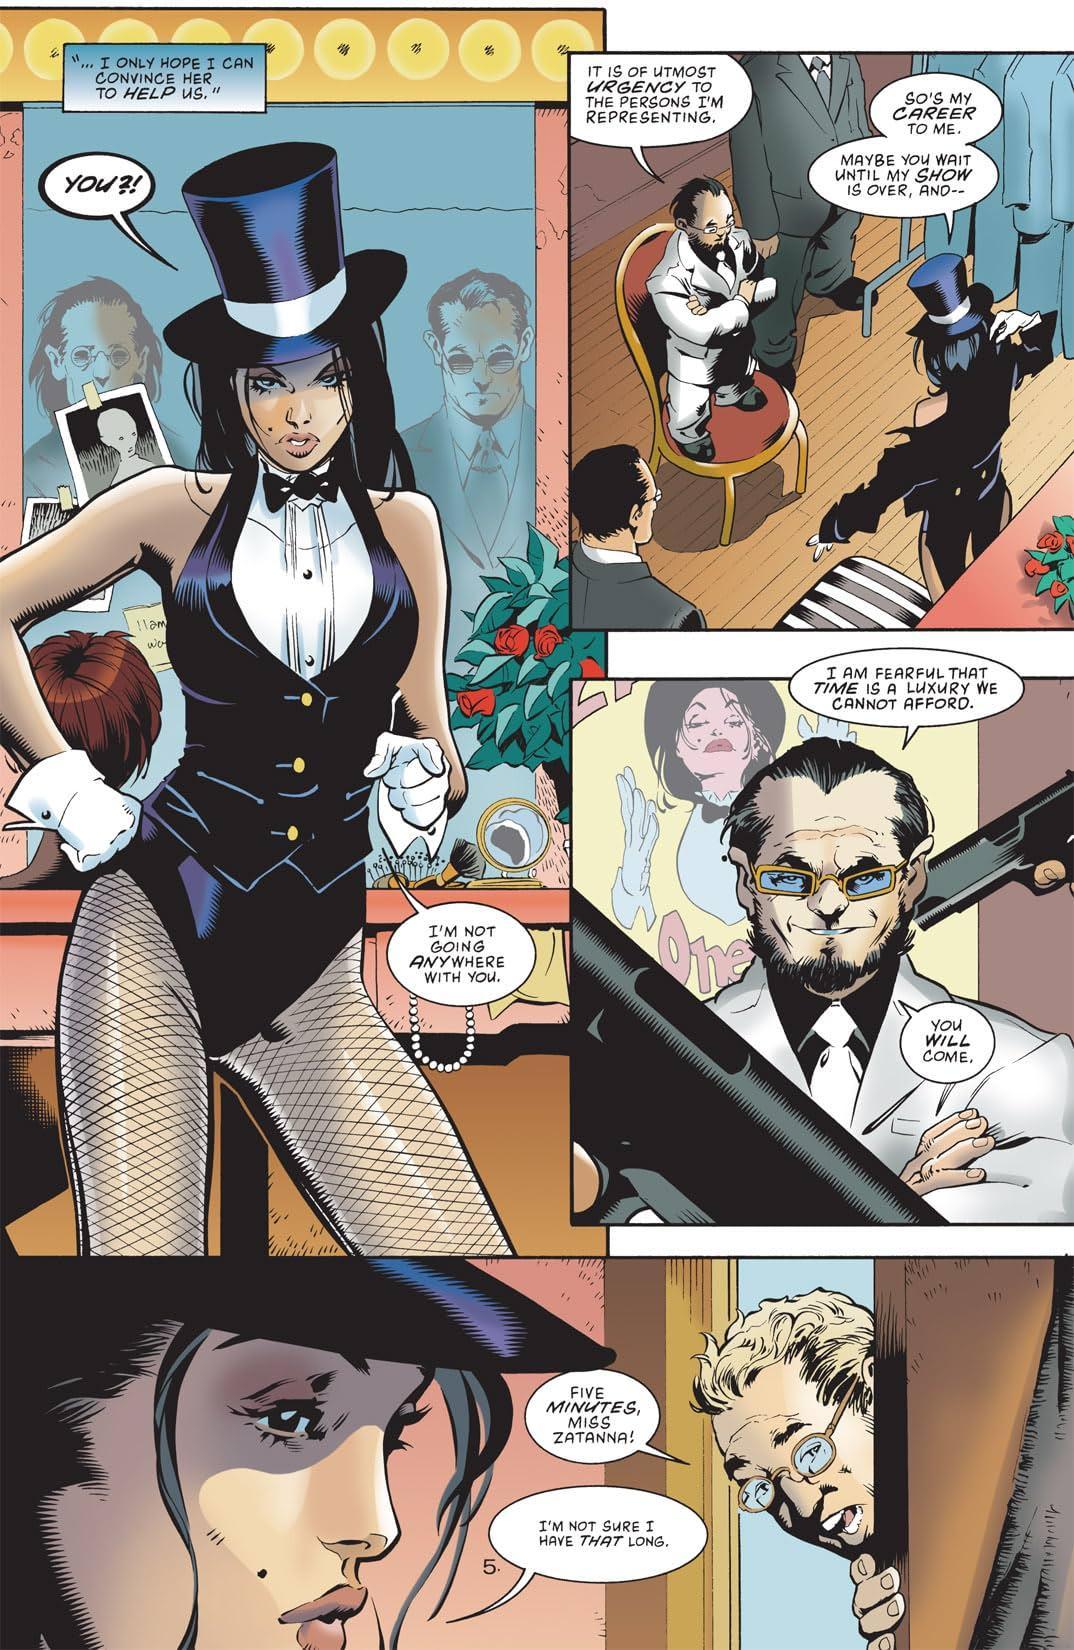 Sins of Youth: Batboy and Robin #1